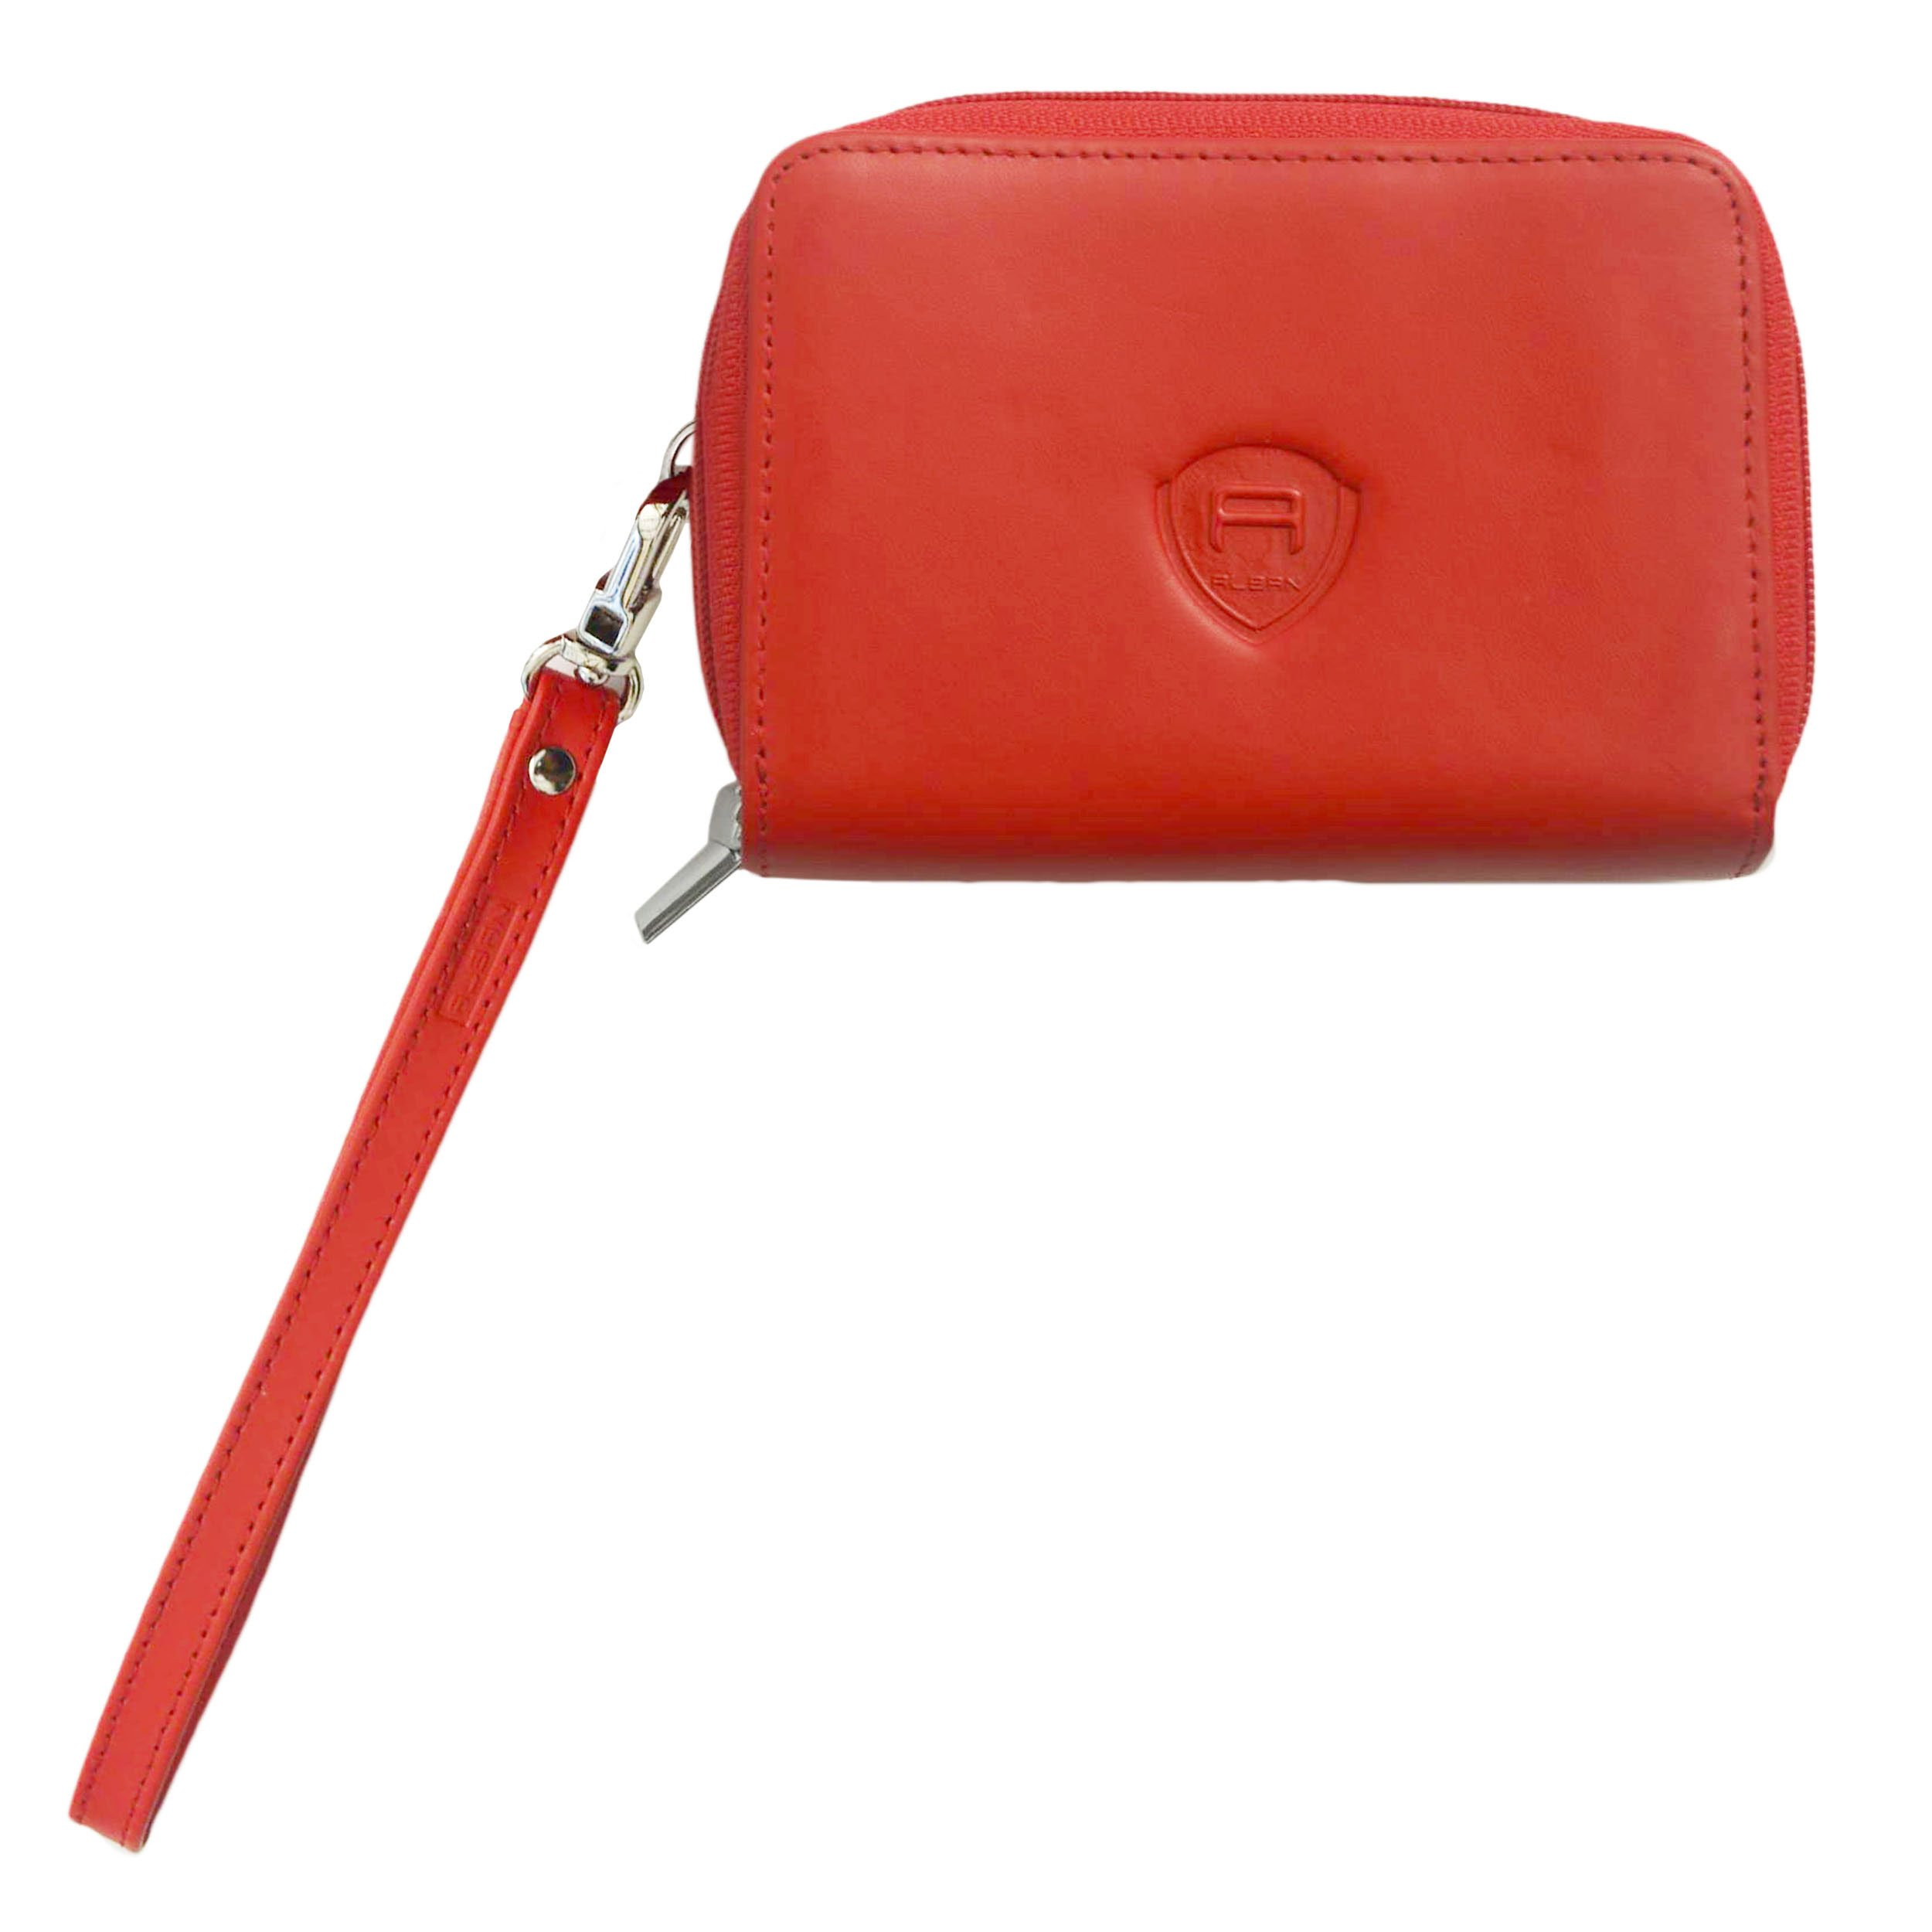 Alban Women's Soft Leather''Accordion Style'' RFID Blocking Wallet Wristlet (Red, Wrist Strap)